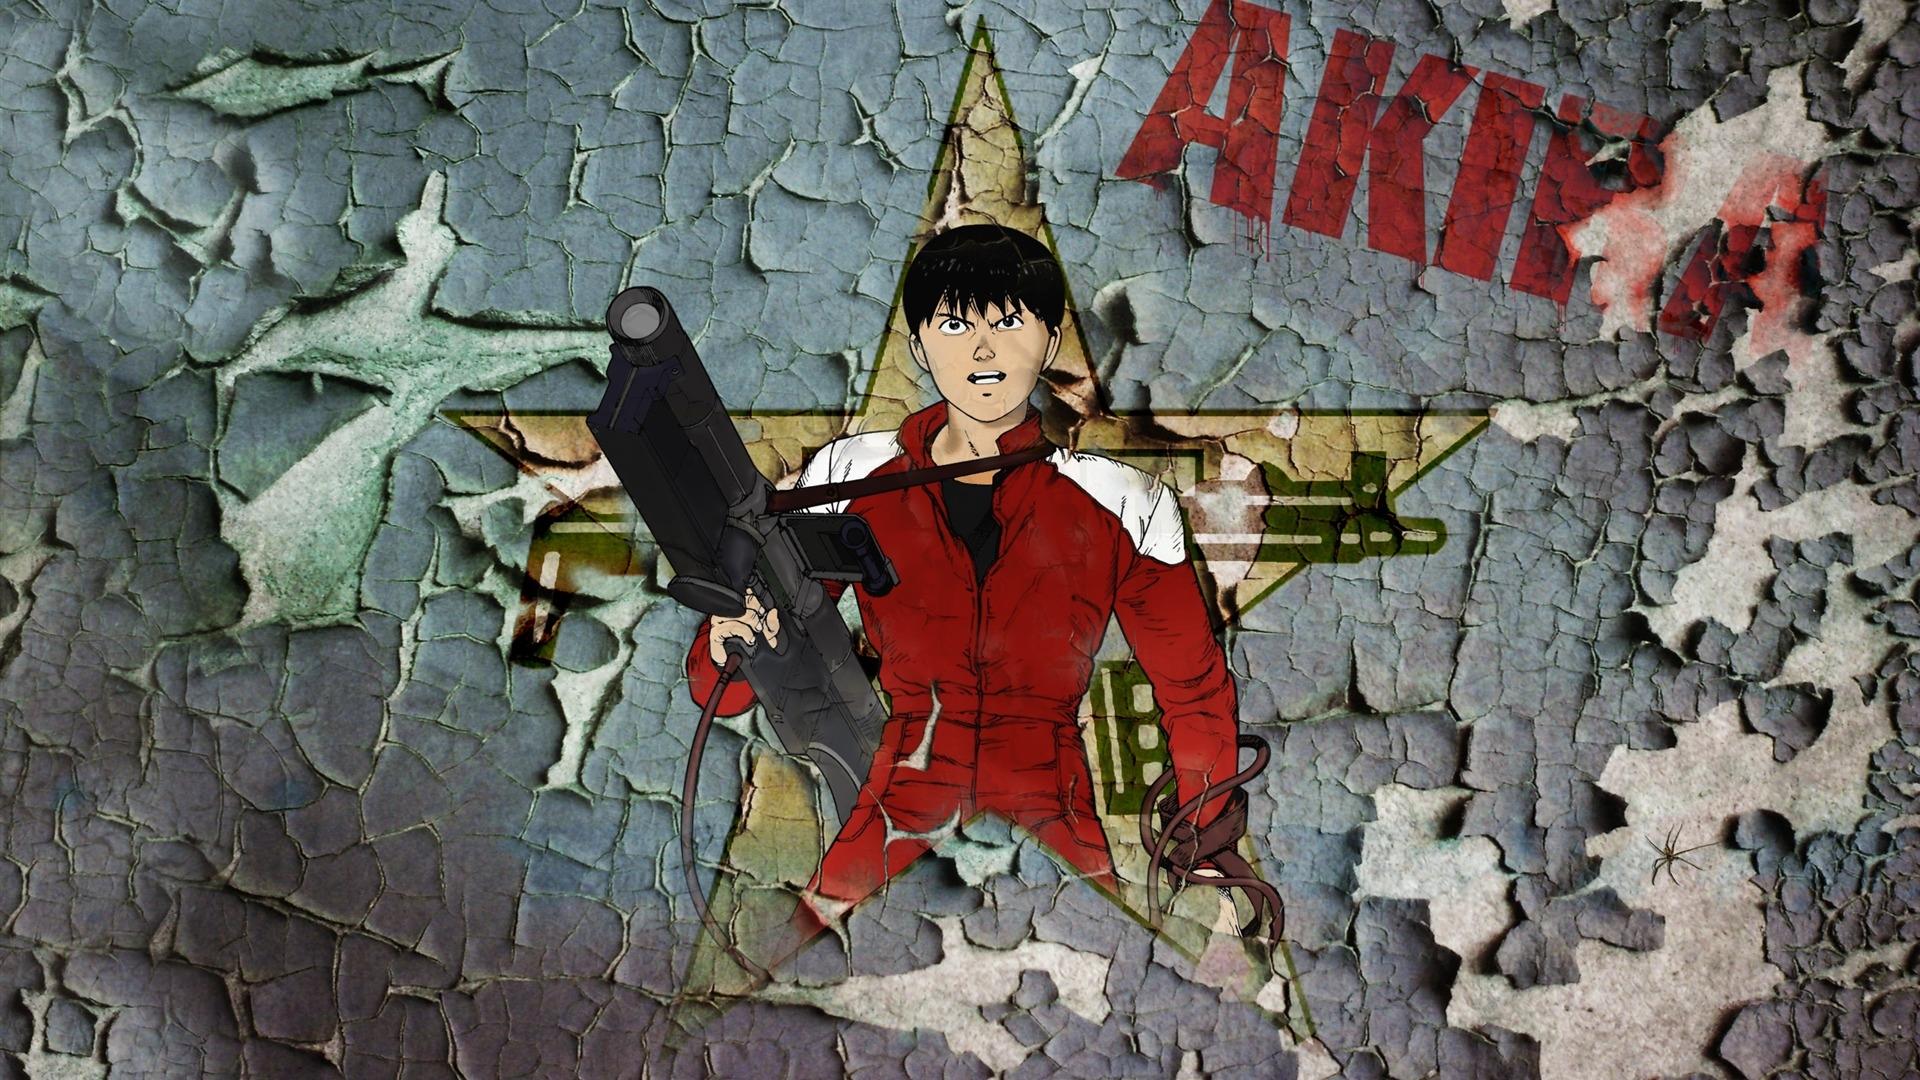 Akira Wallpaper wallpaper download